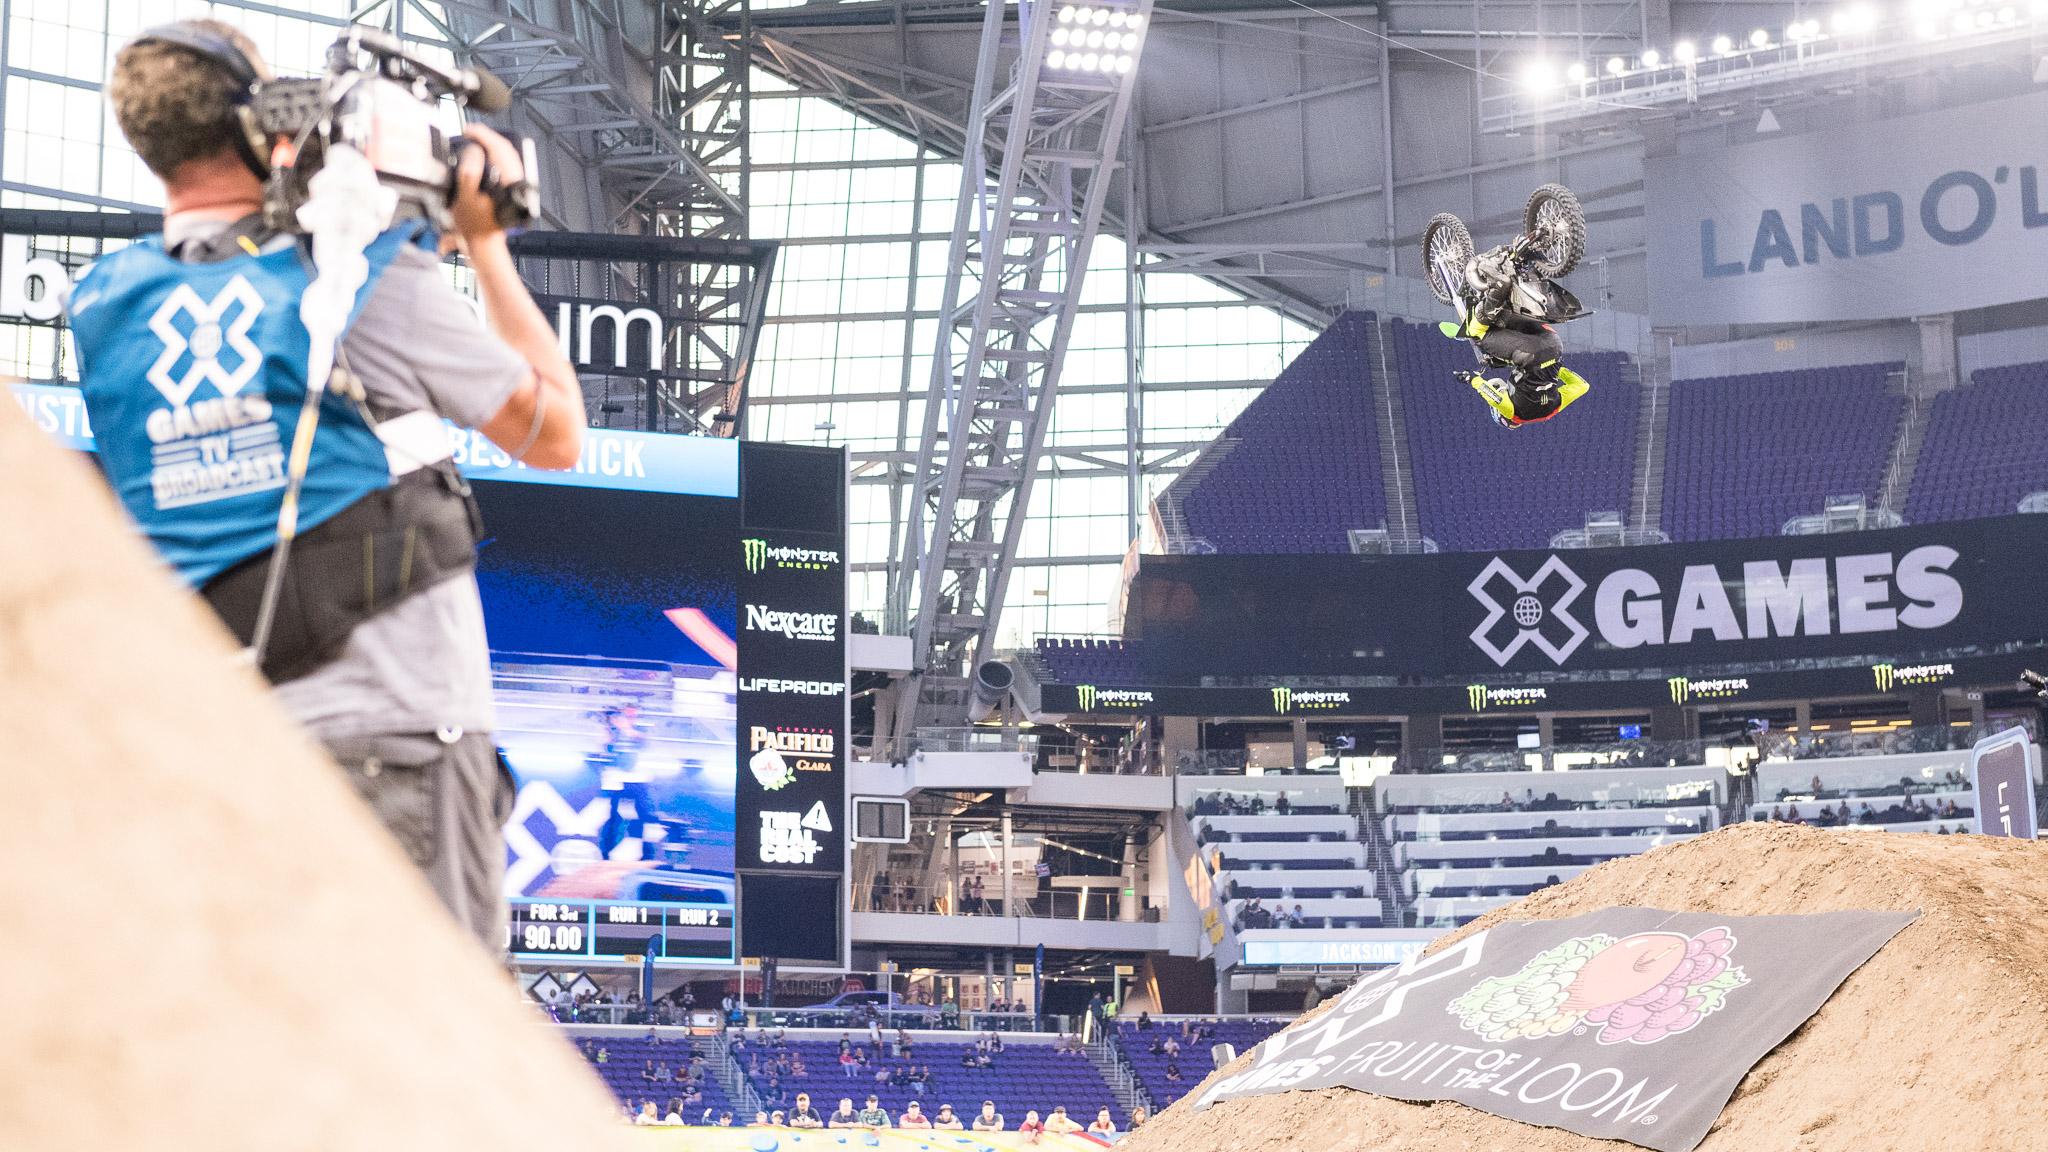 X Games Shanghai 2019: Jackson Strong